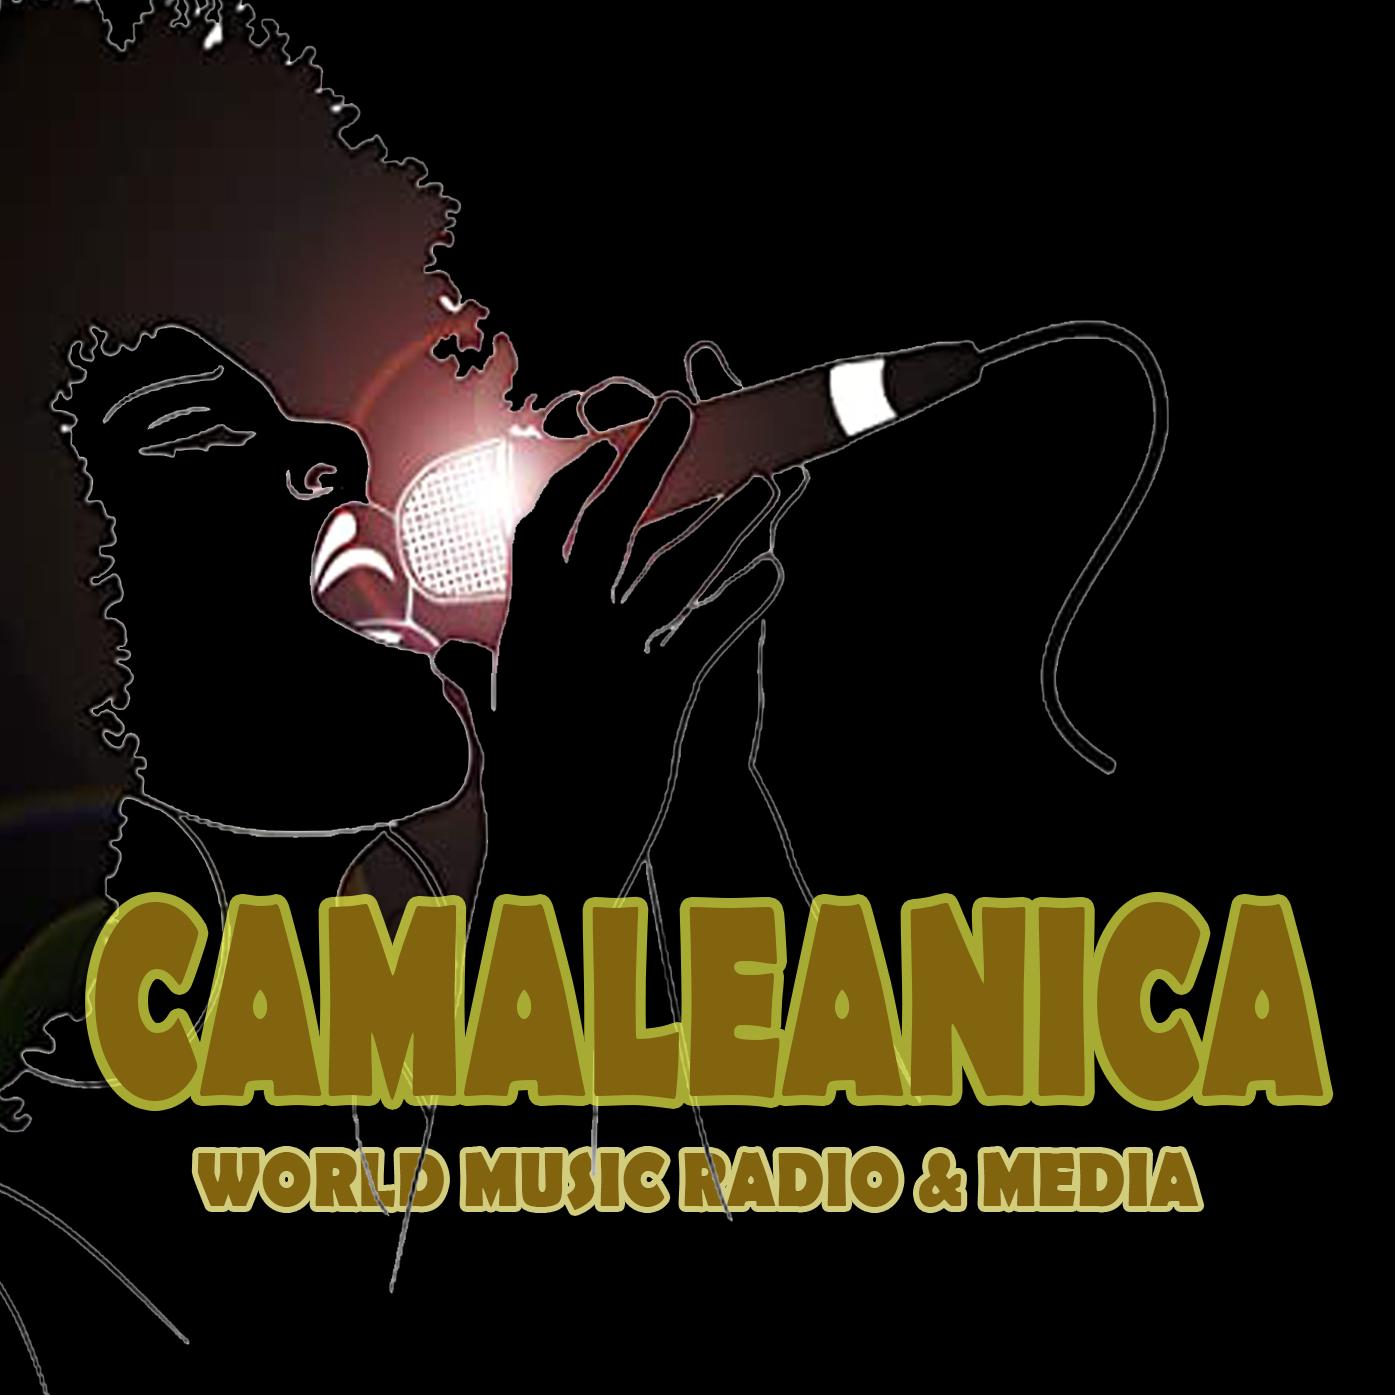 CAMALEONICA - WORLD MUSICA & MEDIA